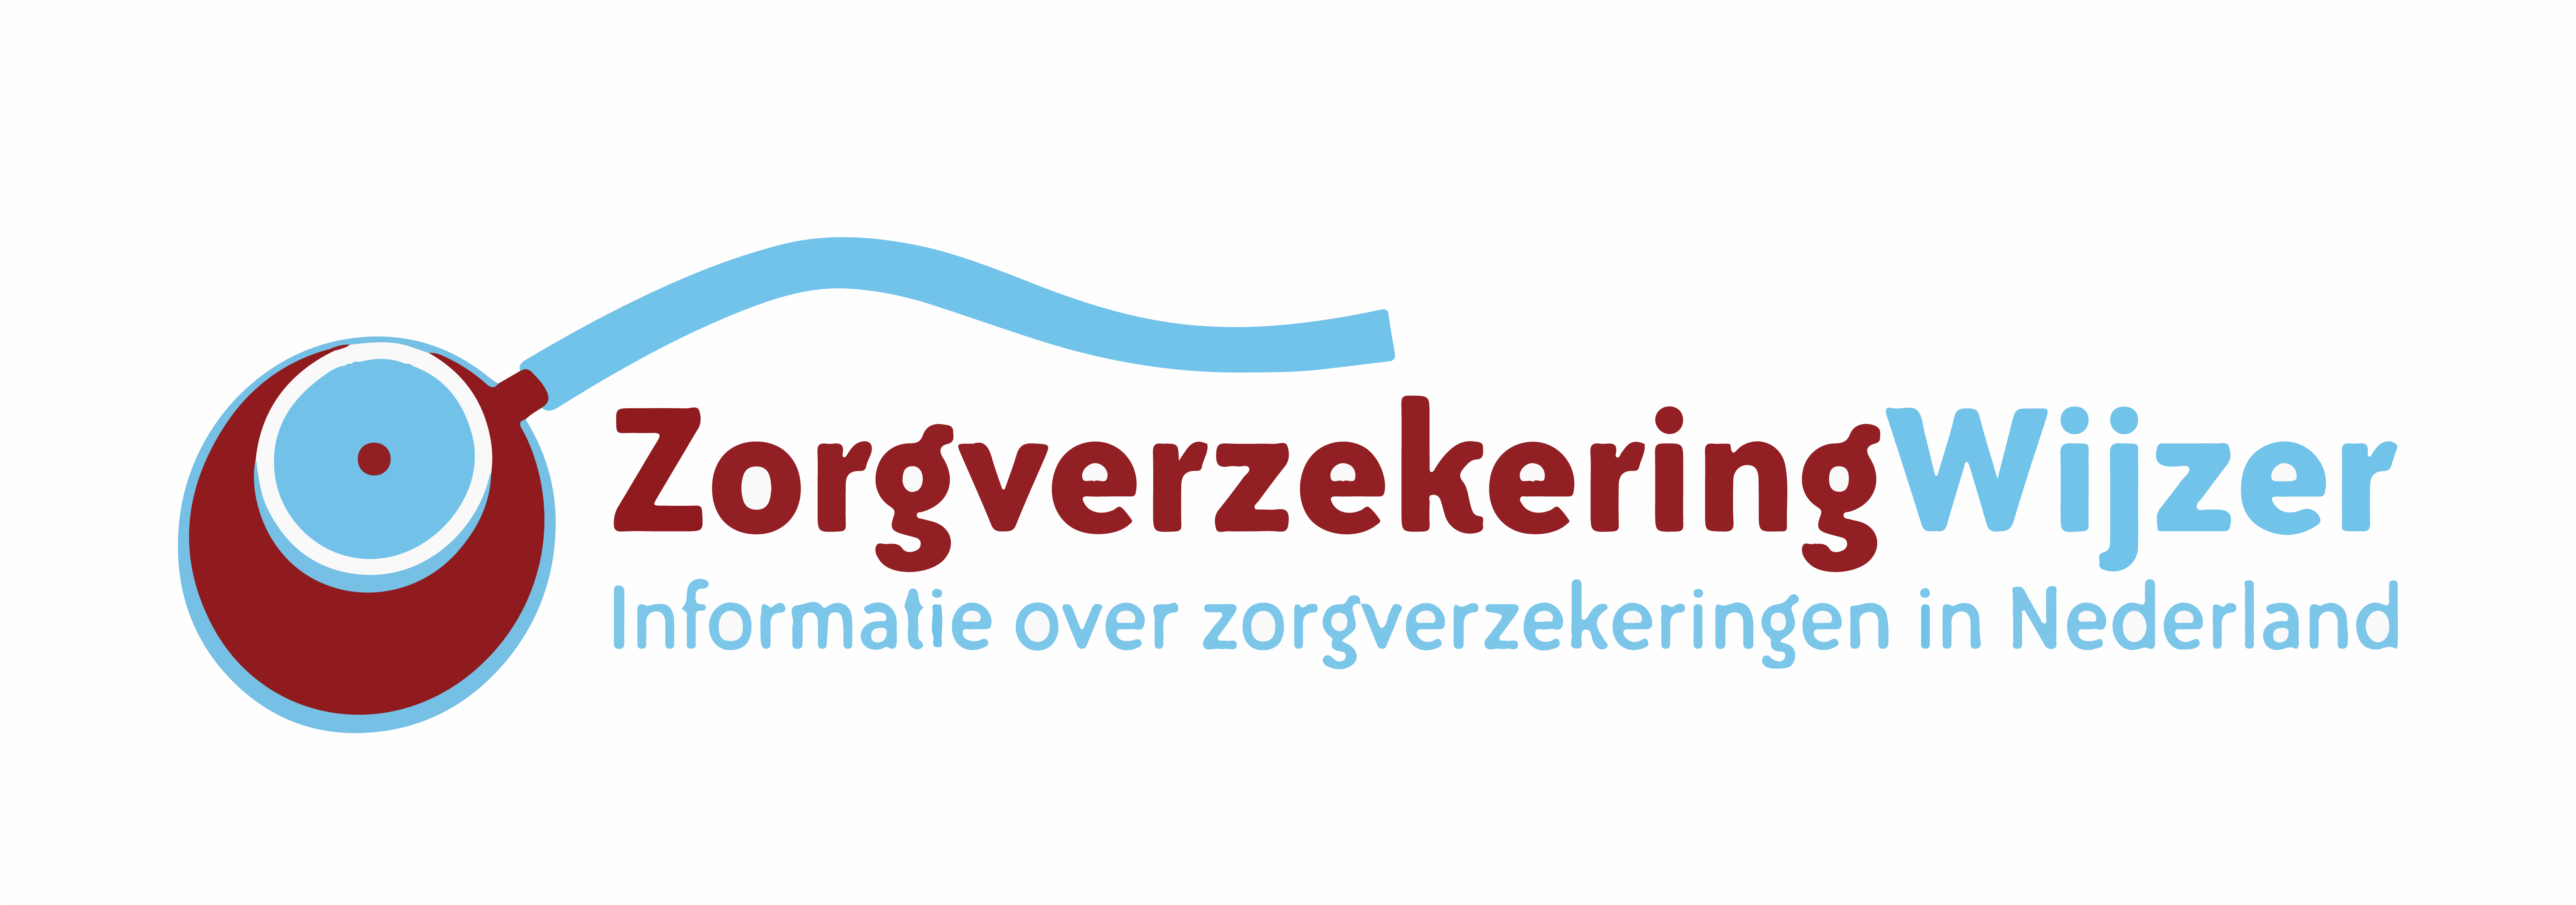 zorgverzekeringswijzer logo-01